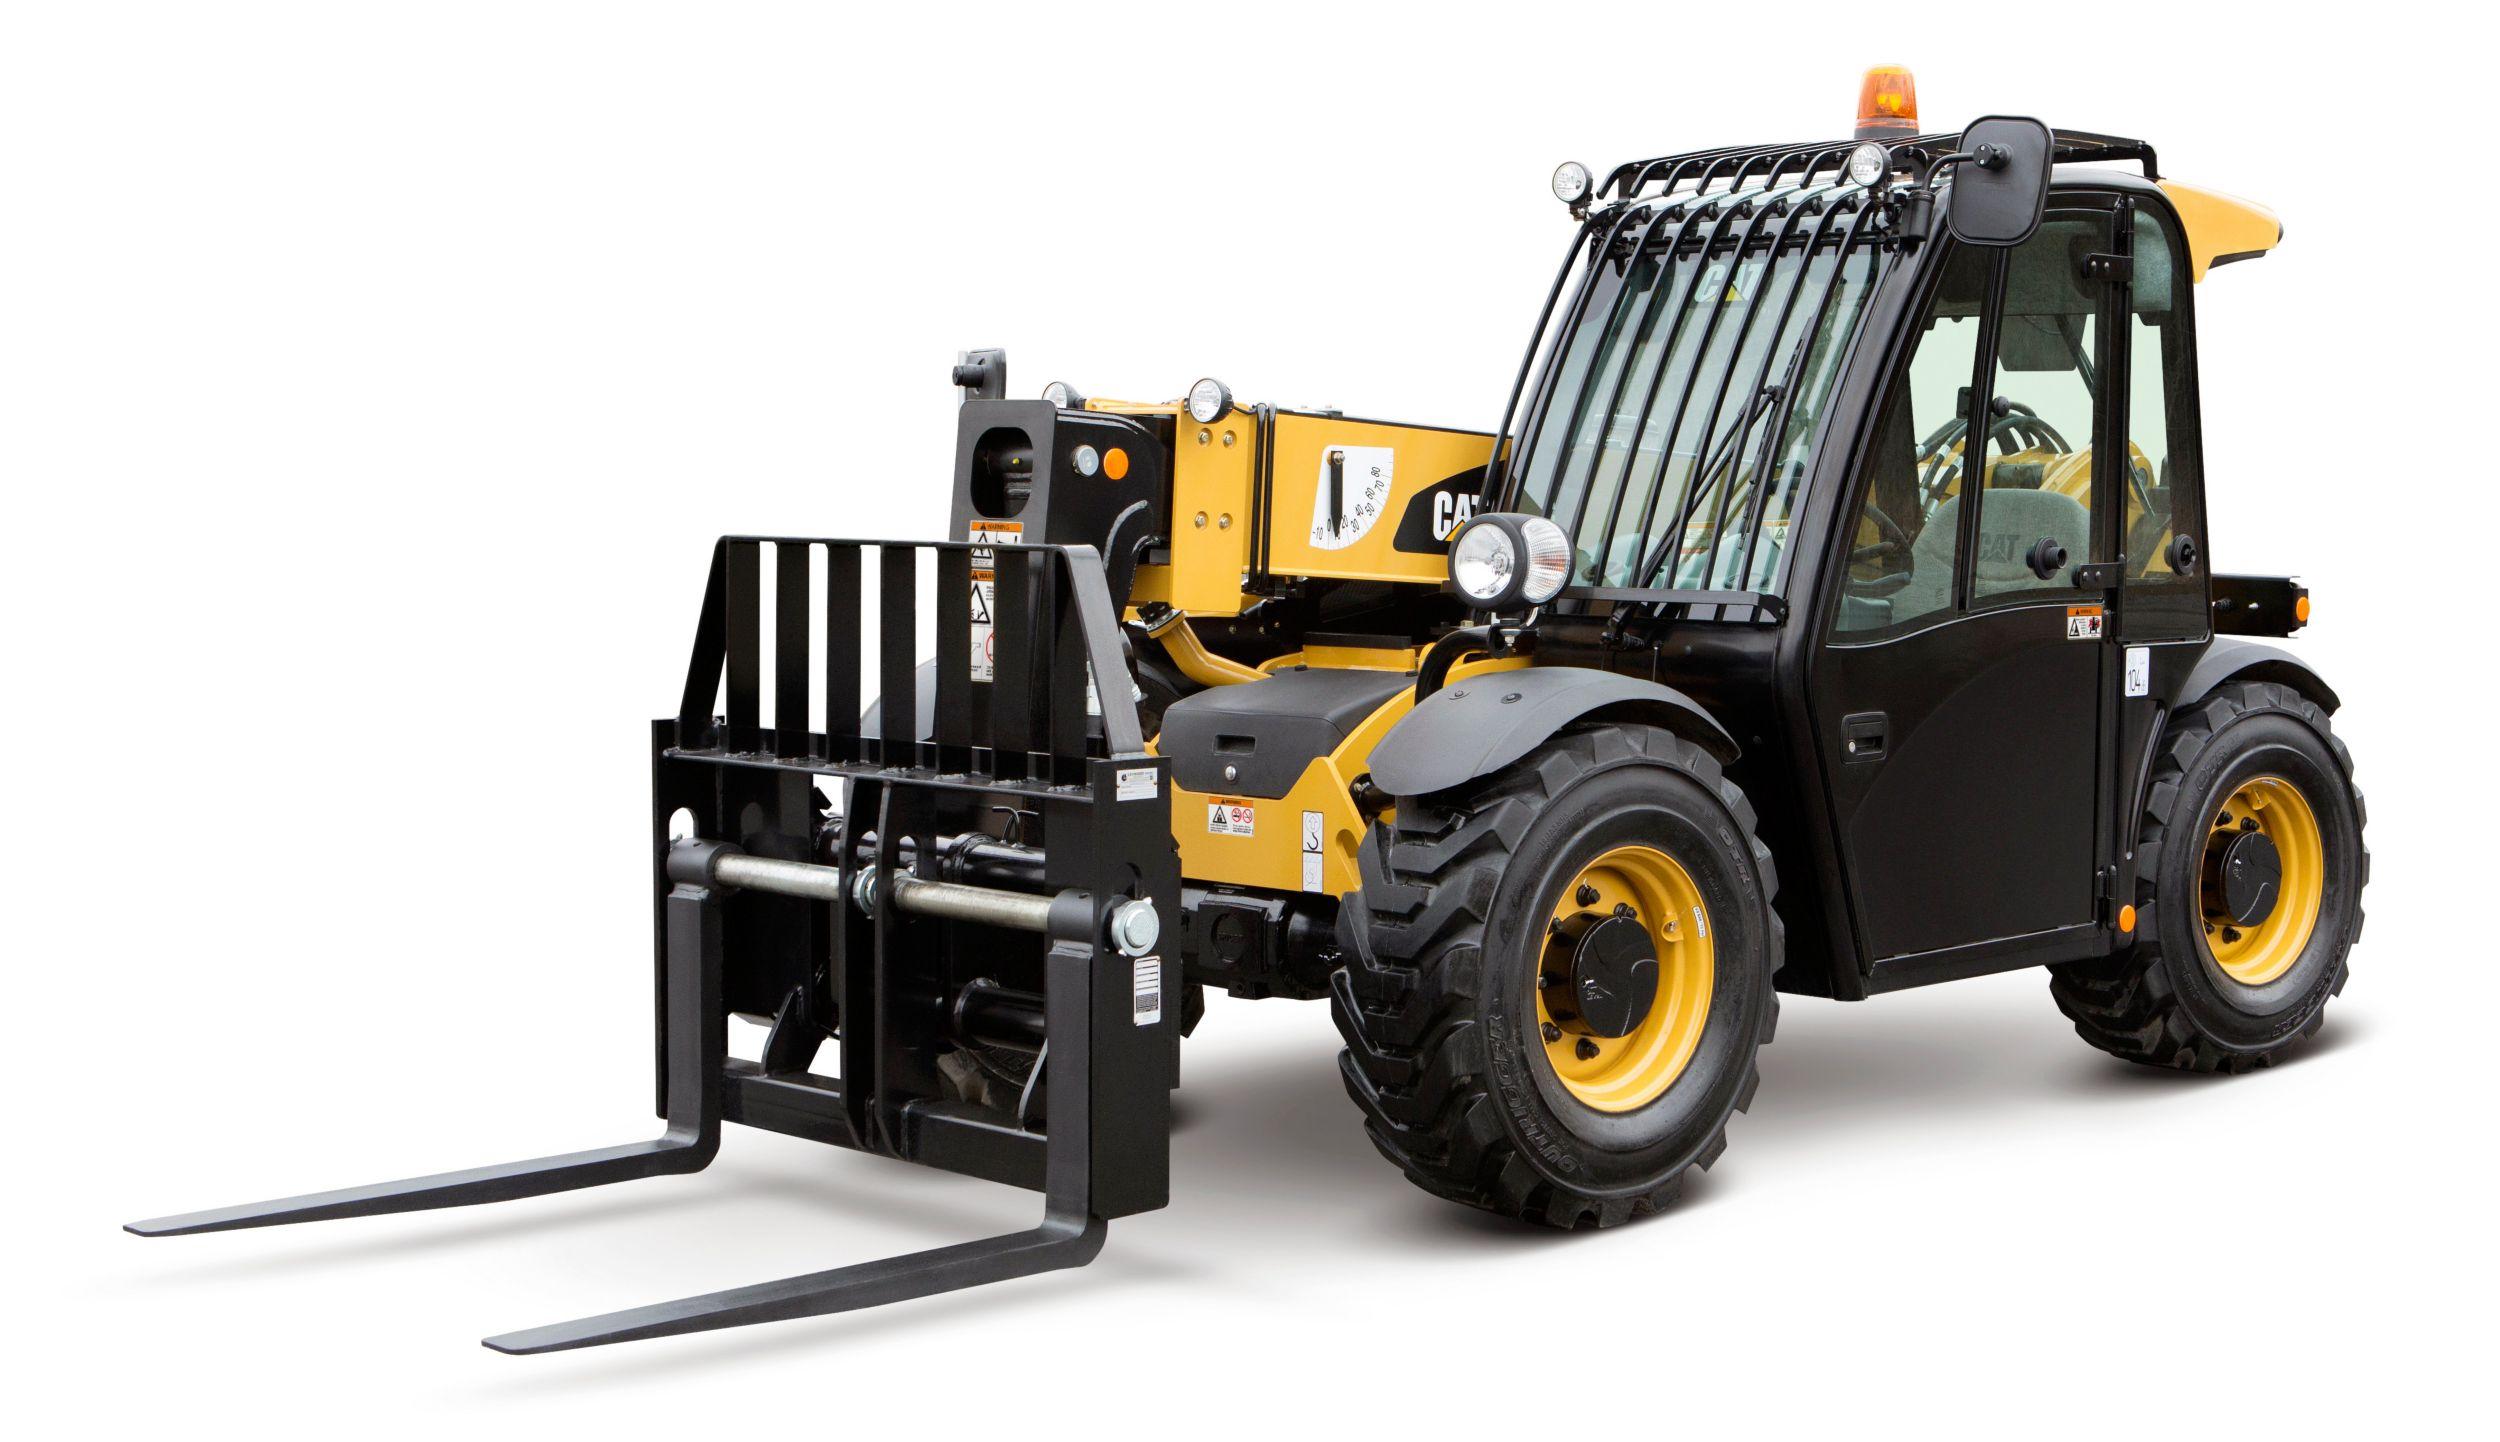 Texas Forklift, Telehandler Rentals: Construction Equipment